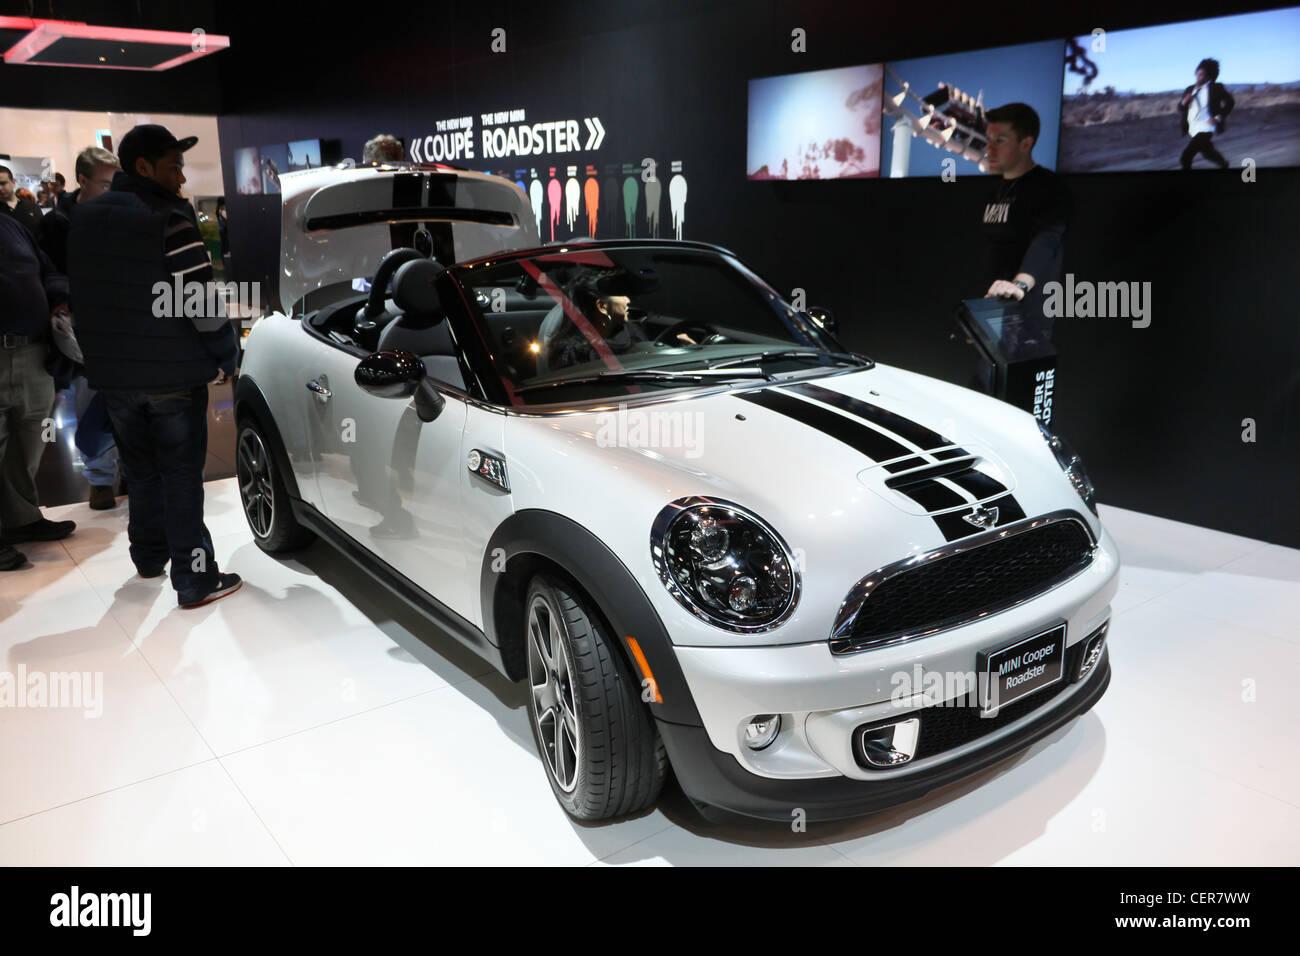 White Mini Convertible Car Stockfotos & White Mini Convertible Car ...